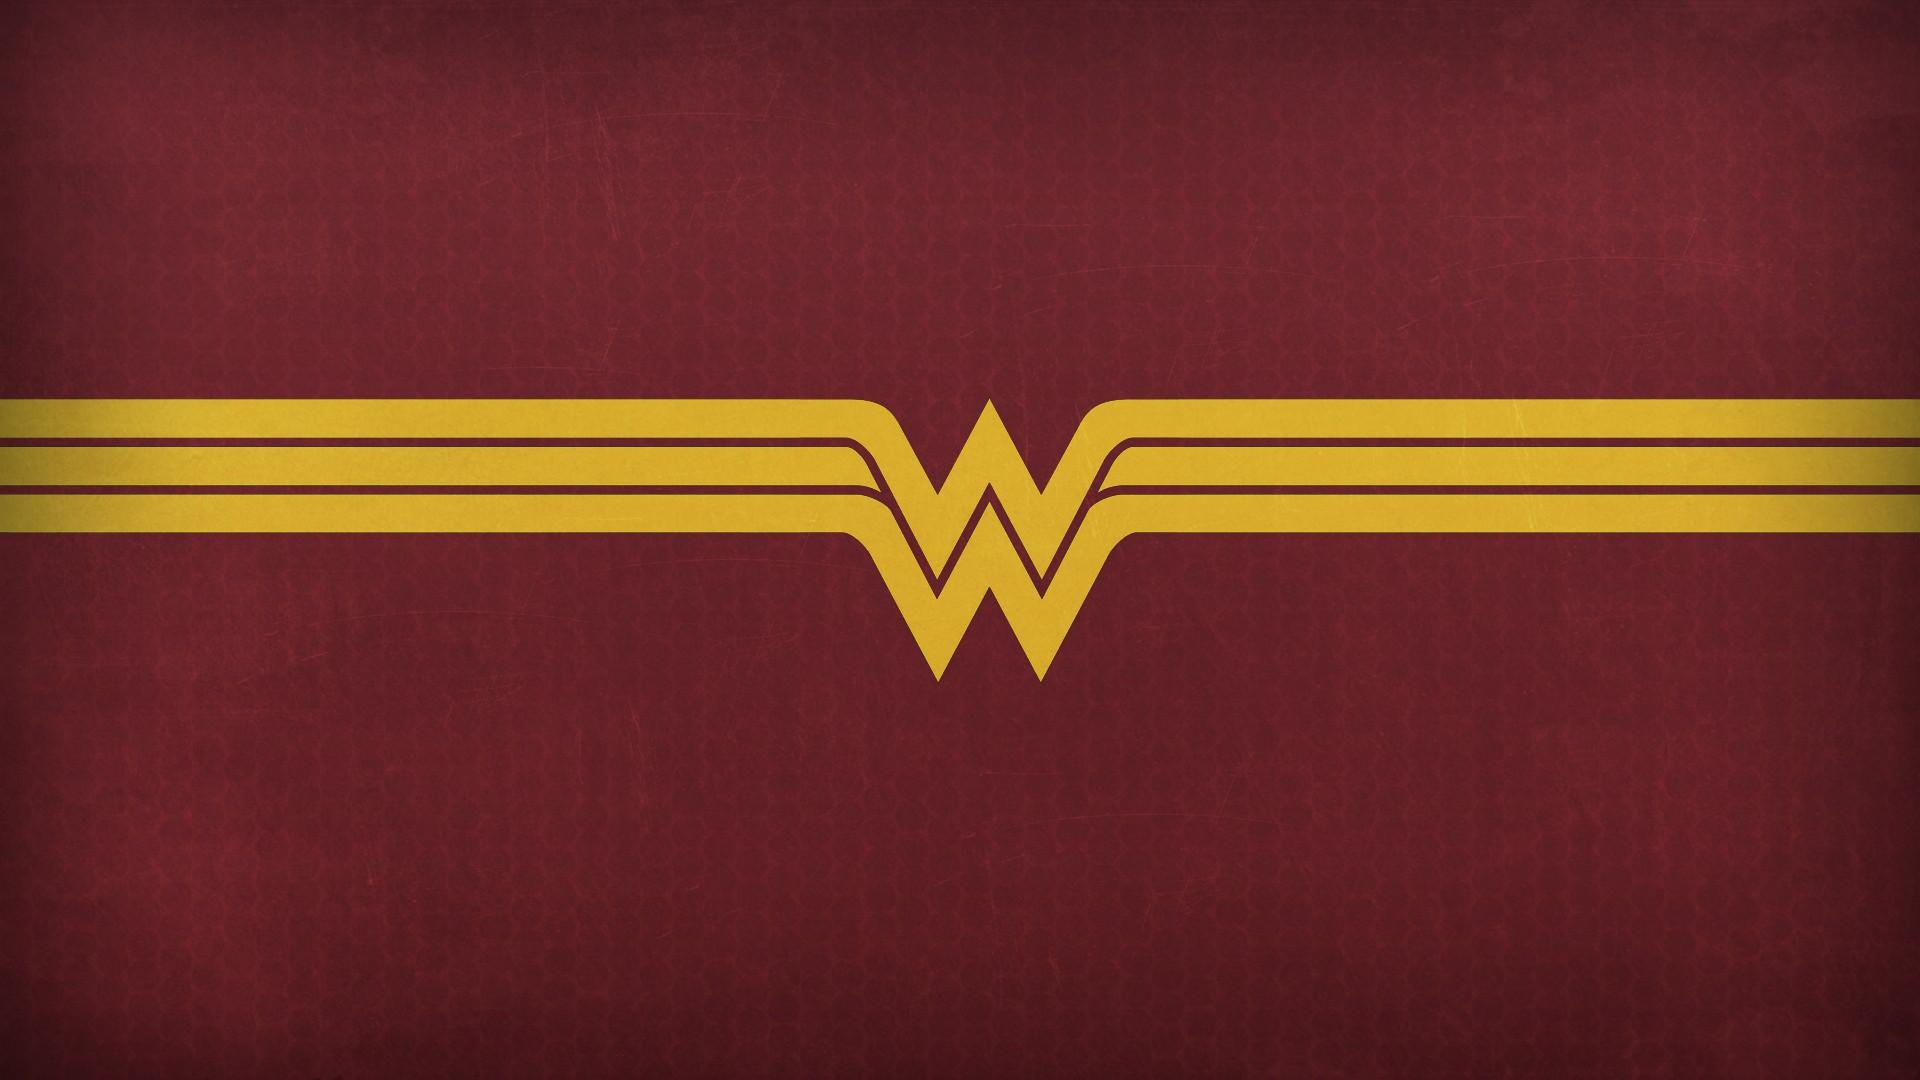 Free Wonder Woman Wallpaper: Wonder Woman Logo 2, HD Superheroes, 4k Wallpapers, Images